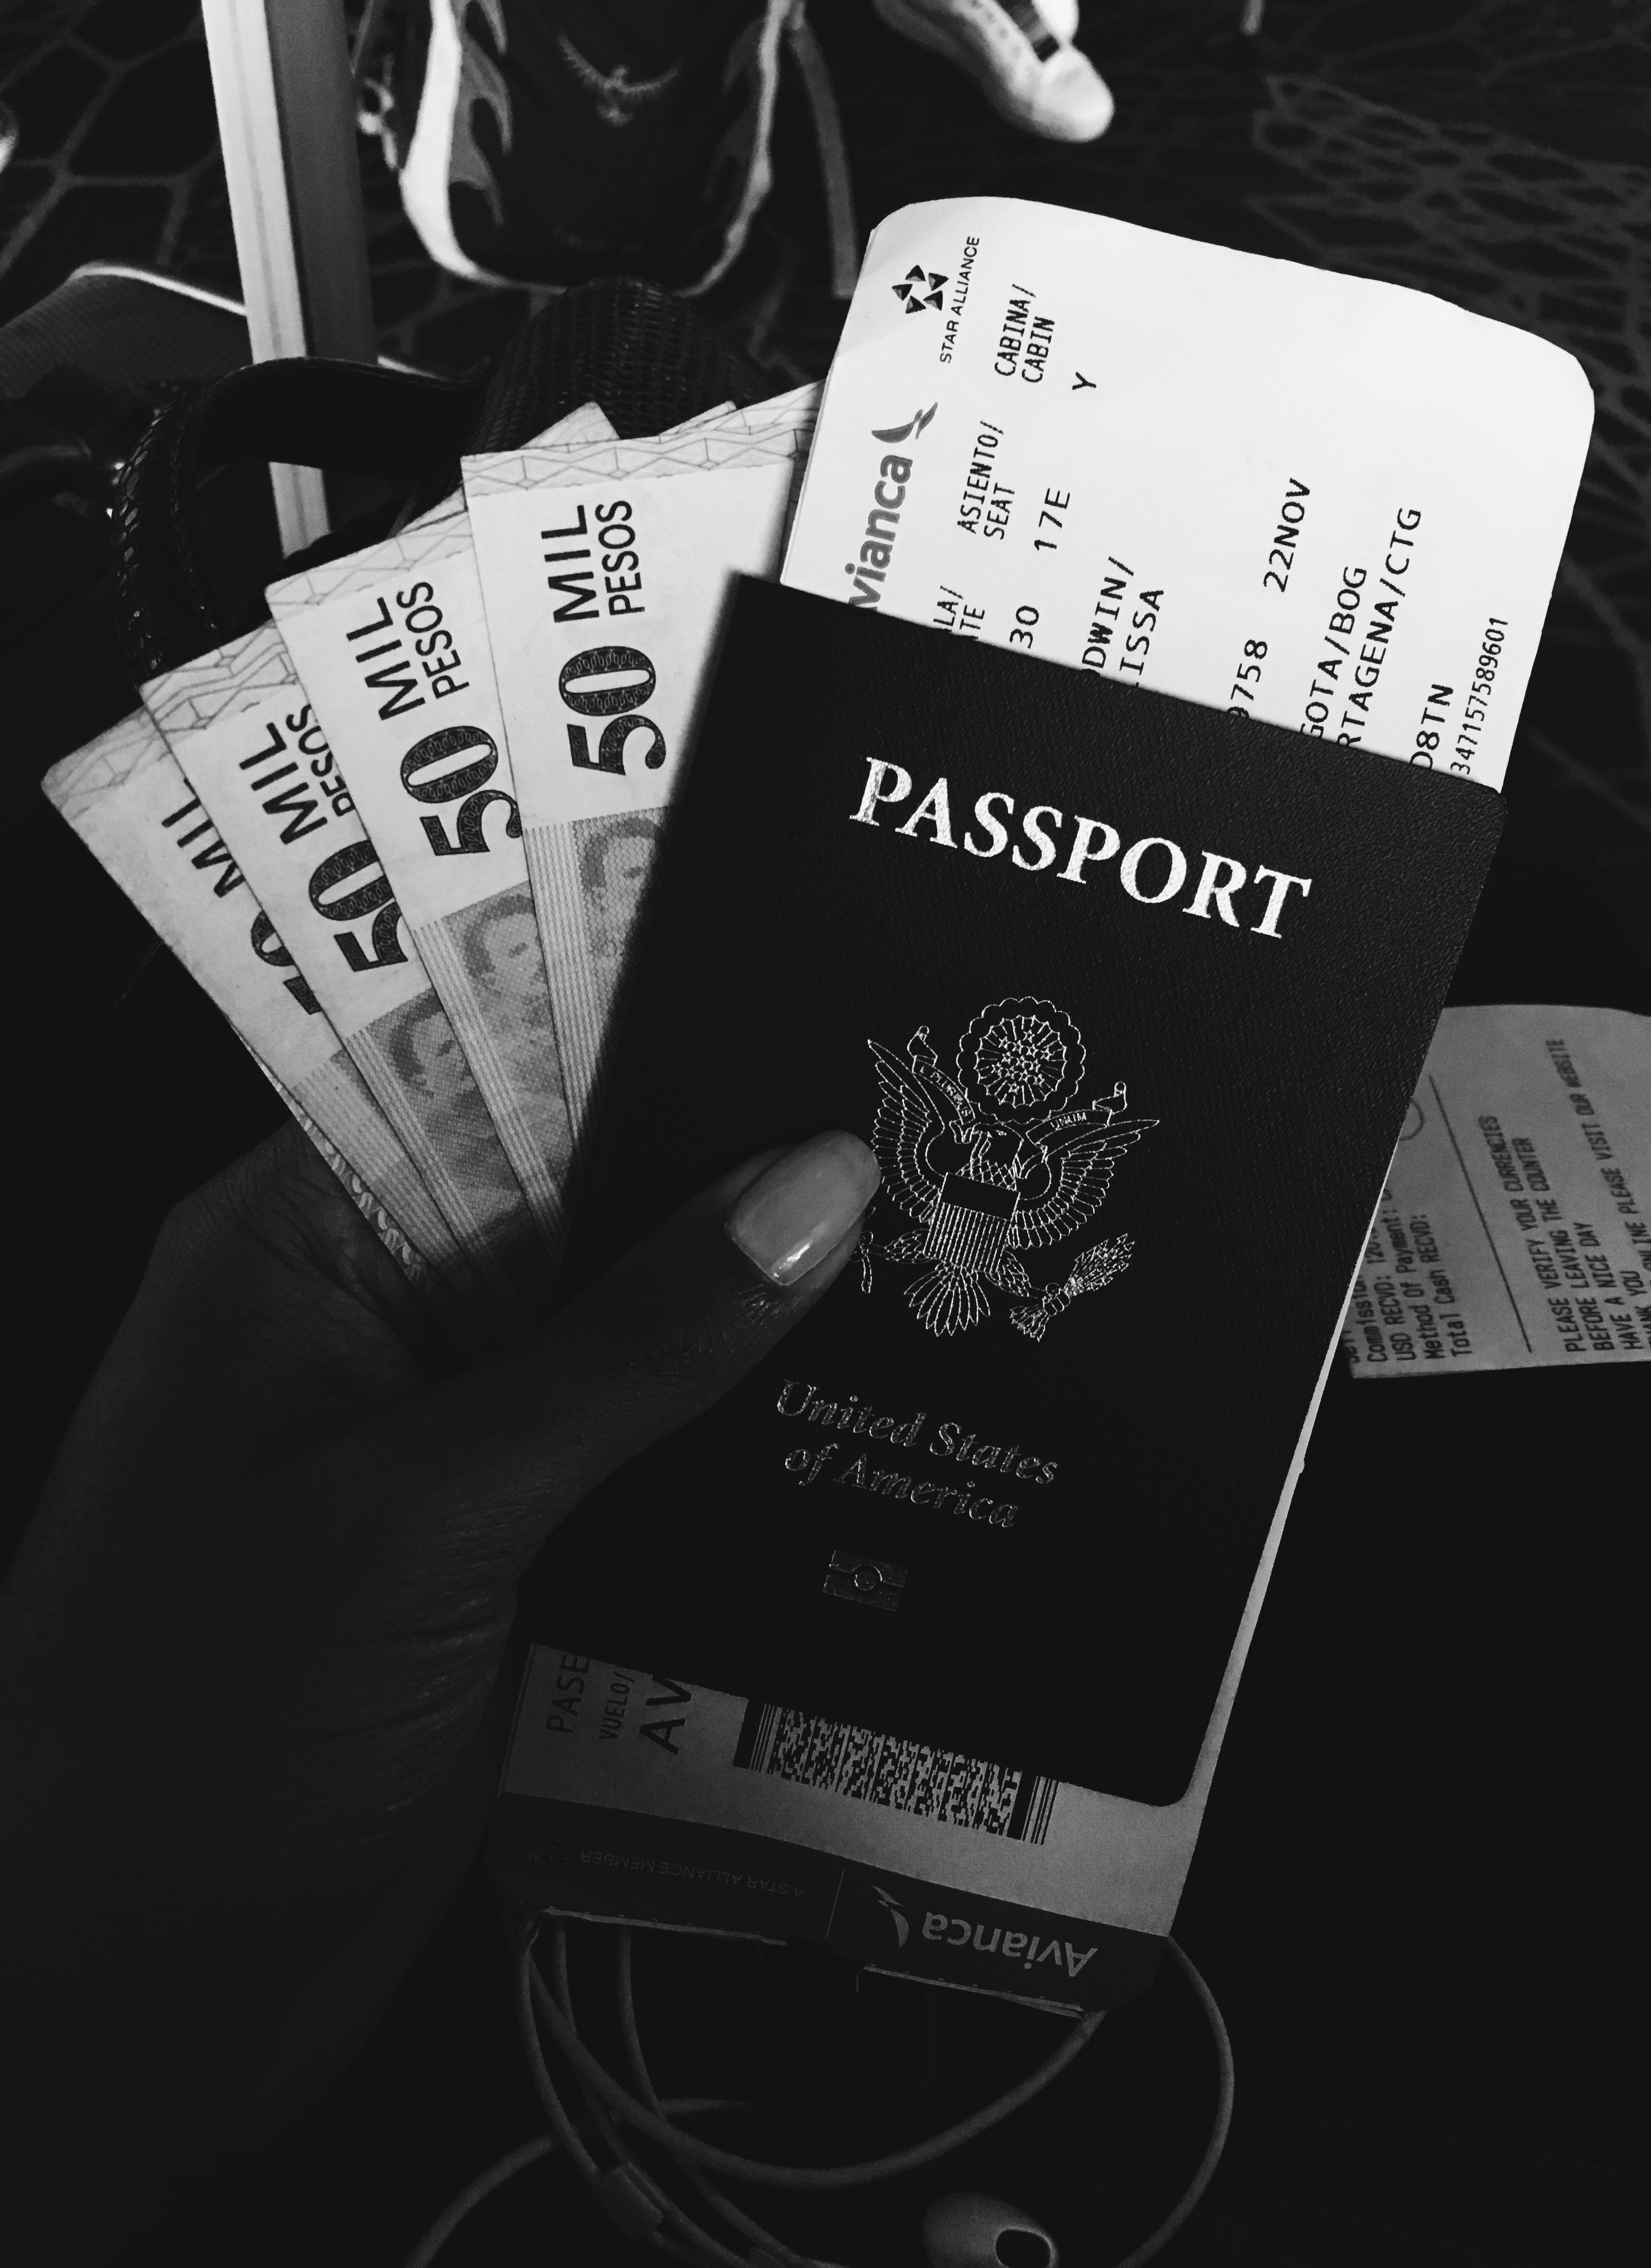 lcm-liveclothesminded-passport-travel